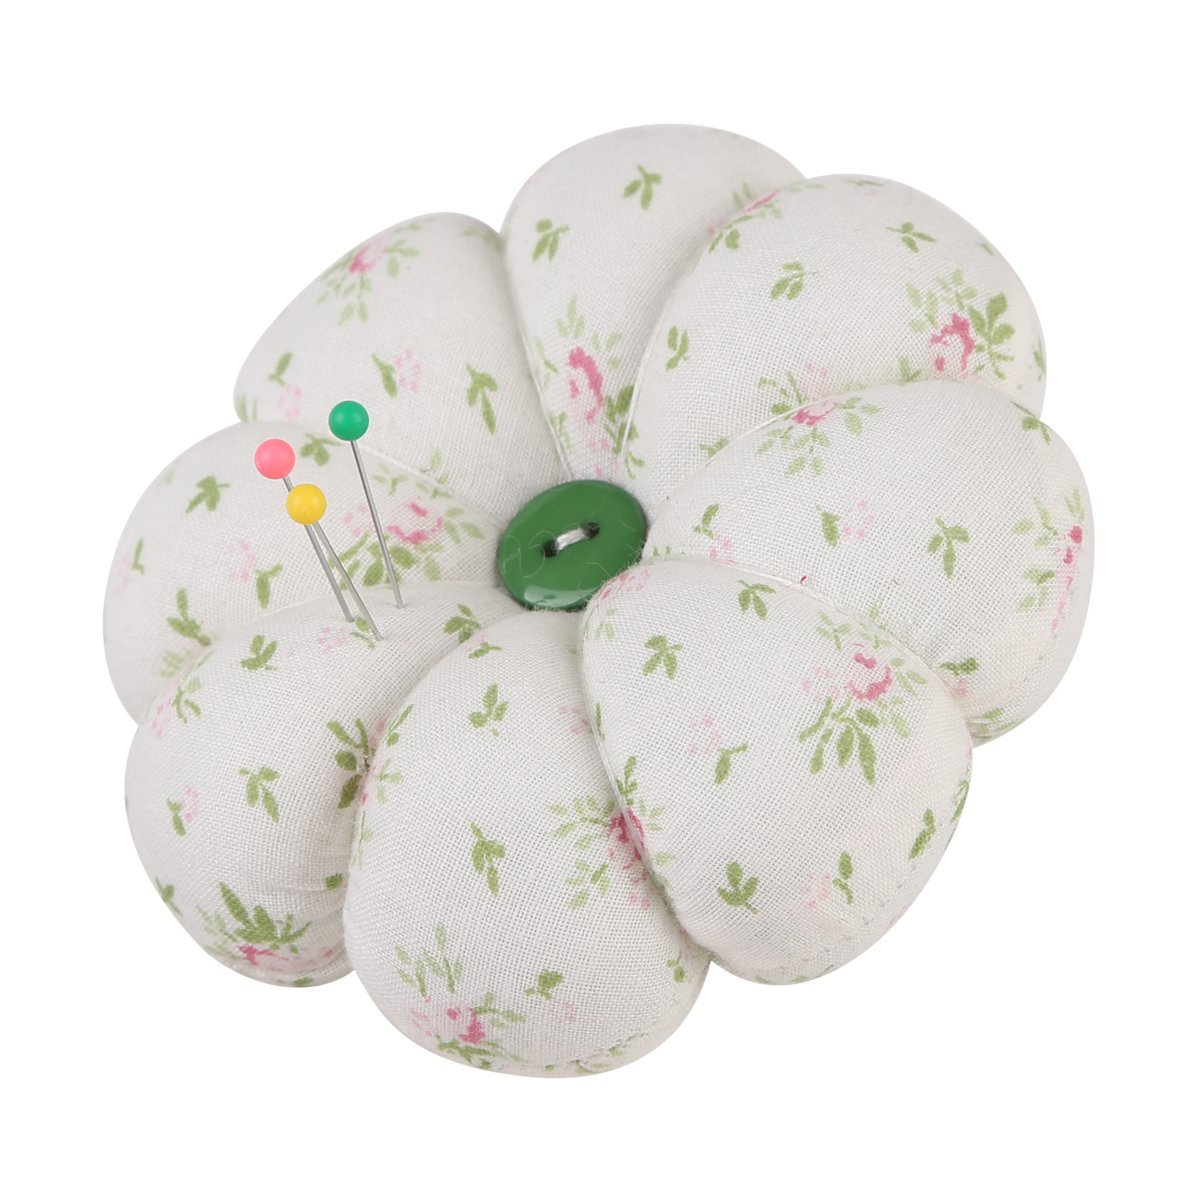 Neoviva Wrist Wearable Pumpkin Pincushion for Needlework Floral Mist Green